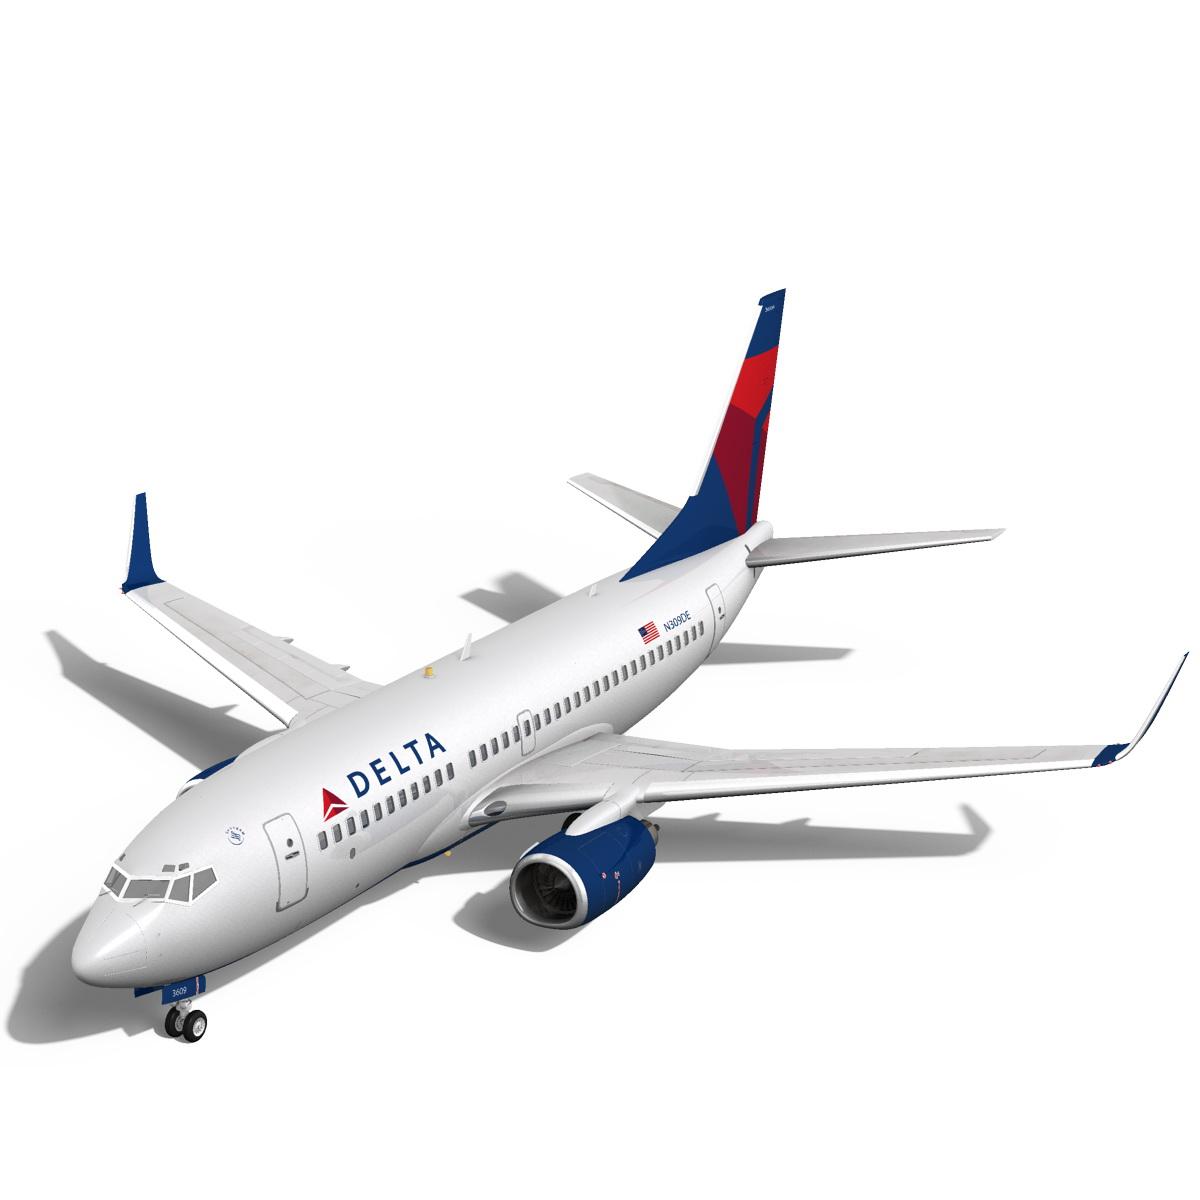 delta airlines boeing 737-700w 3d model max fbx c4d ma mb obj 120306